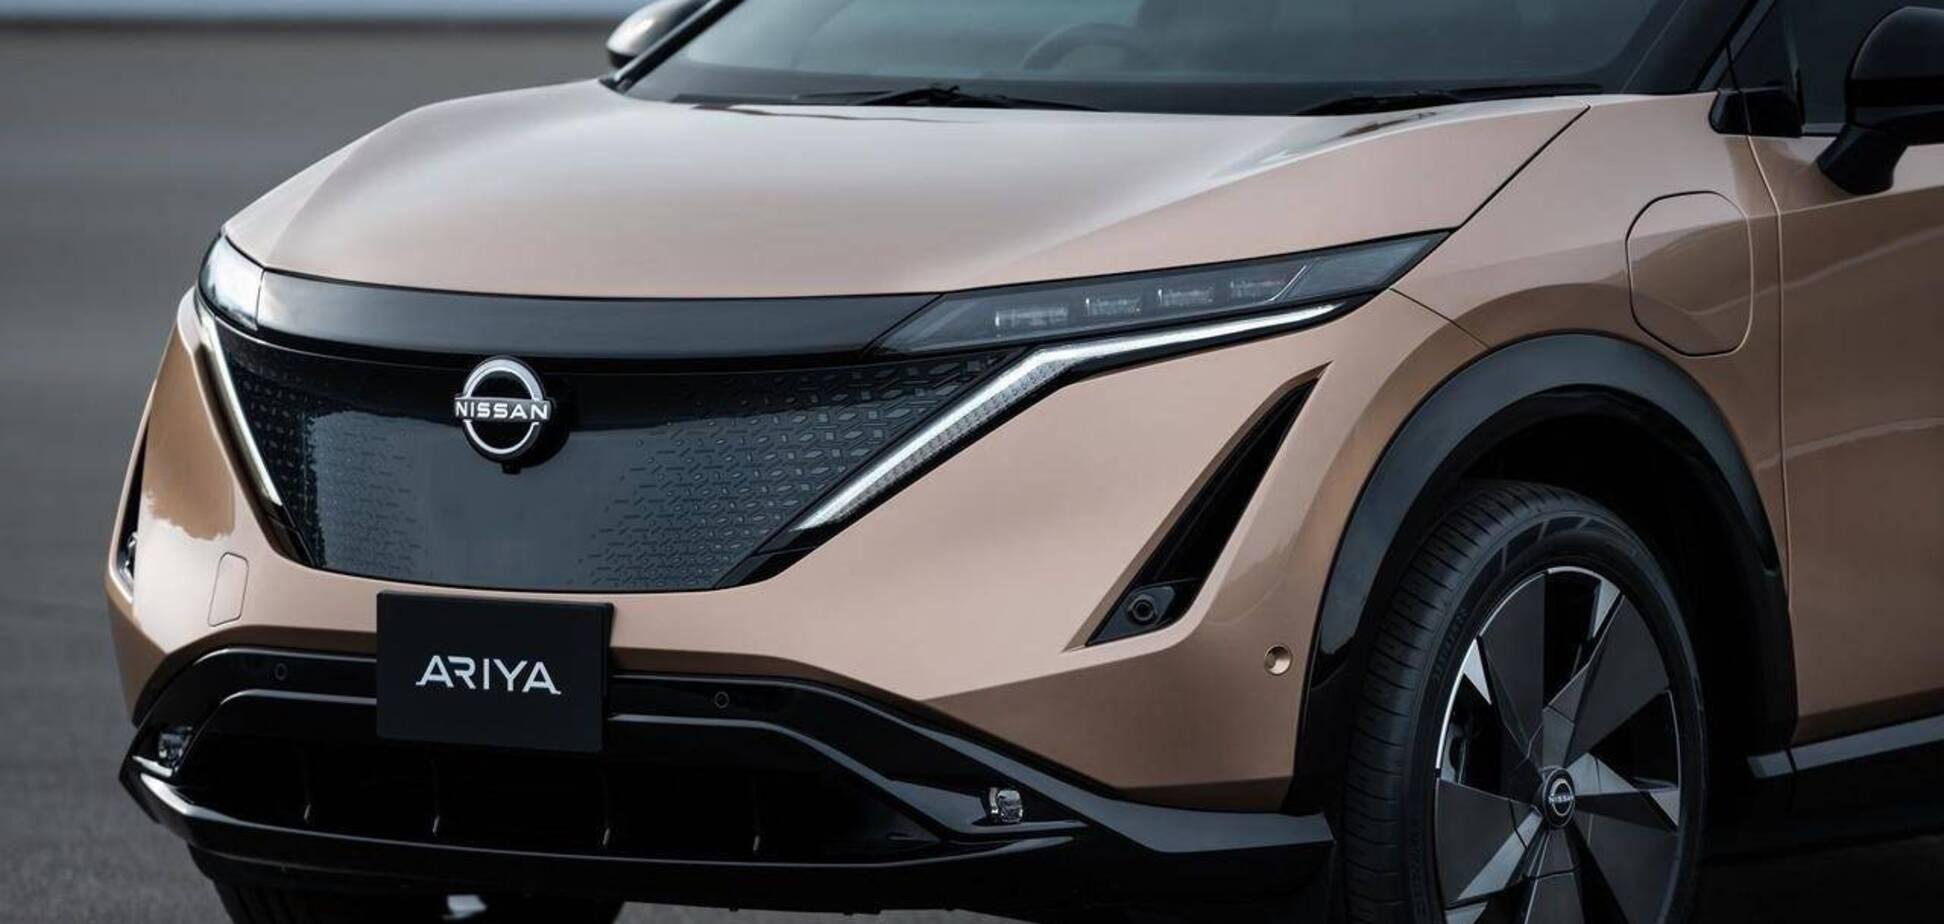 Электромобиль Nissan Ariya полностью рассекречен. Фото: Nissan